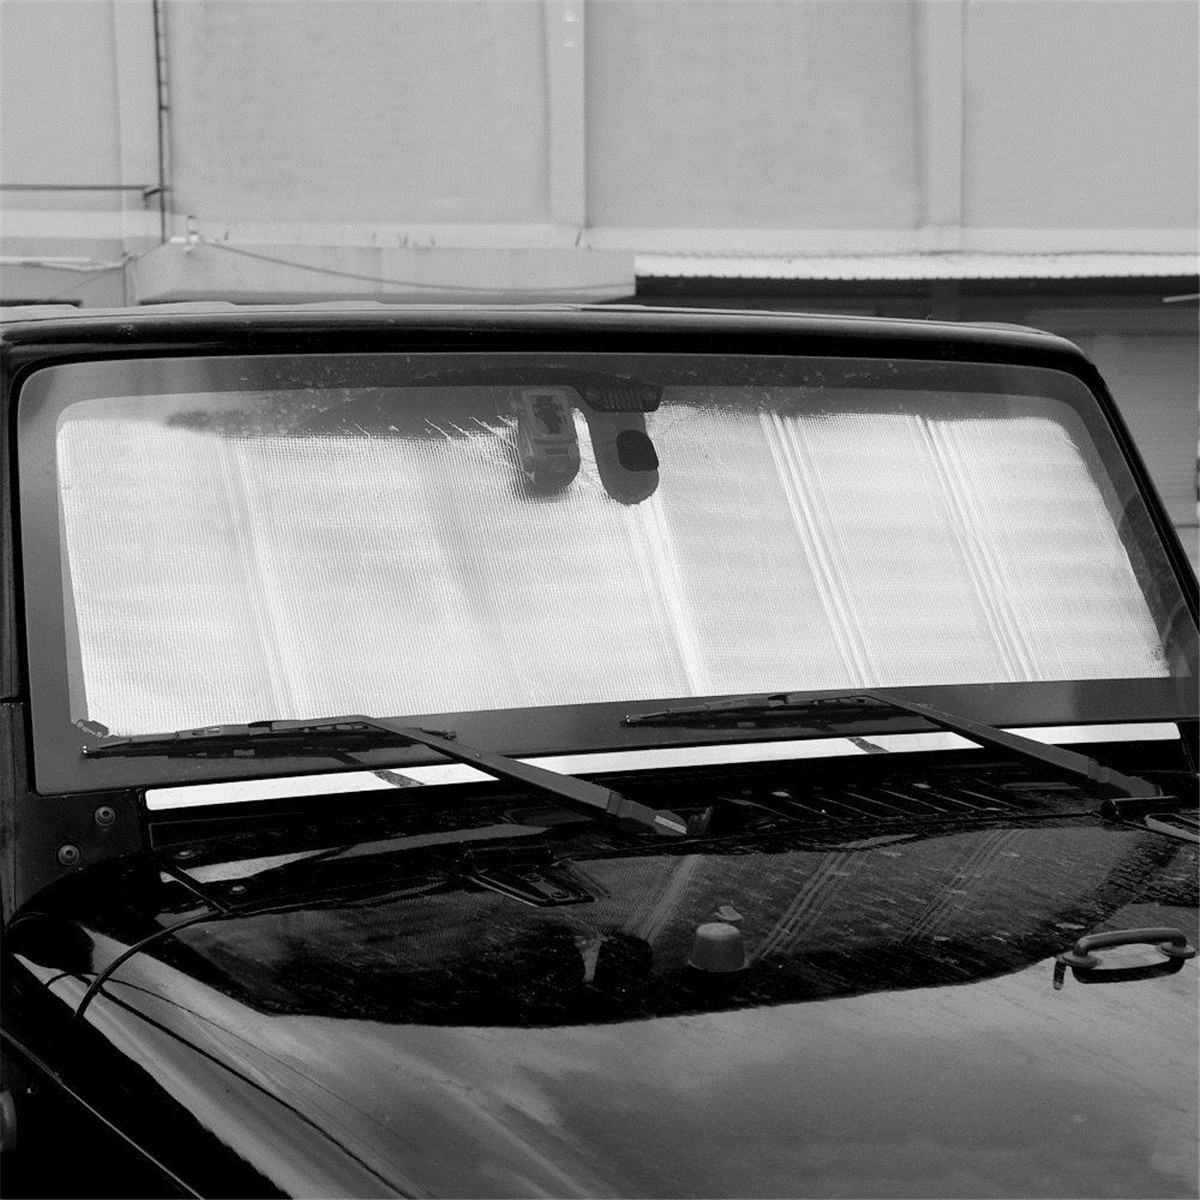 Car Auto Front Windshield SunShade for Jeep Wrangler TJ JK JL 2007-2017+ Car Visor Window Solar UV Rays Protector Cover